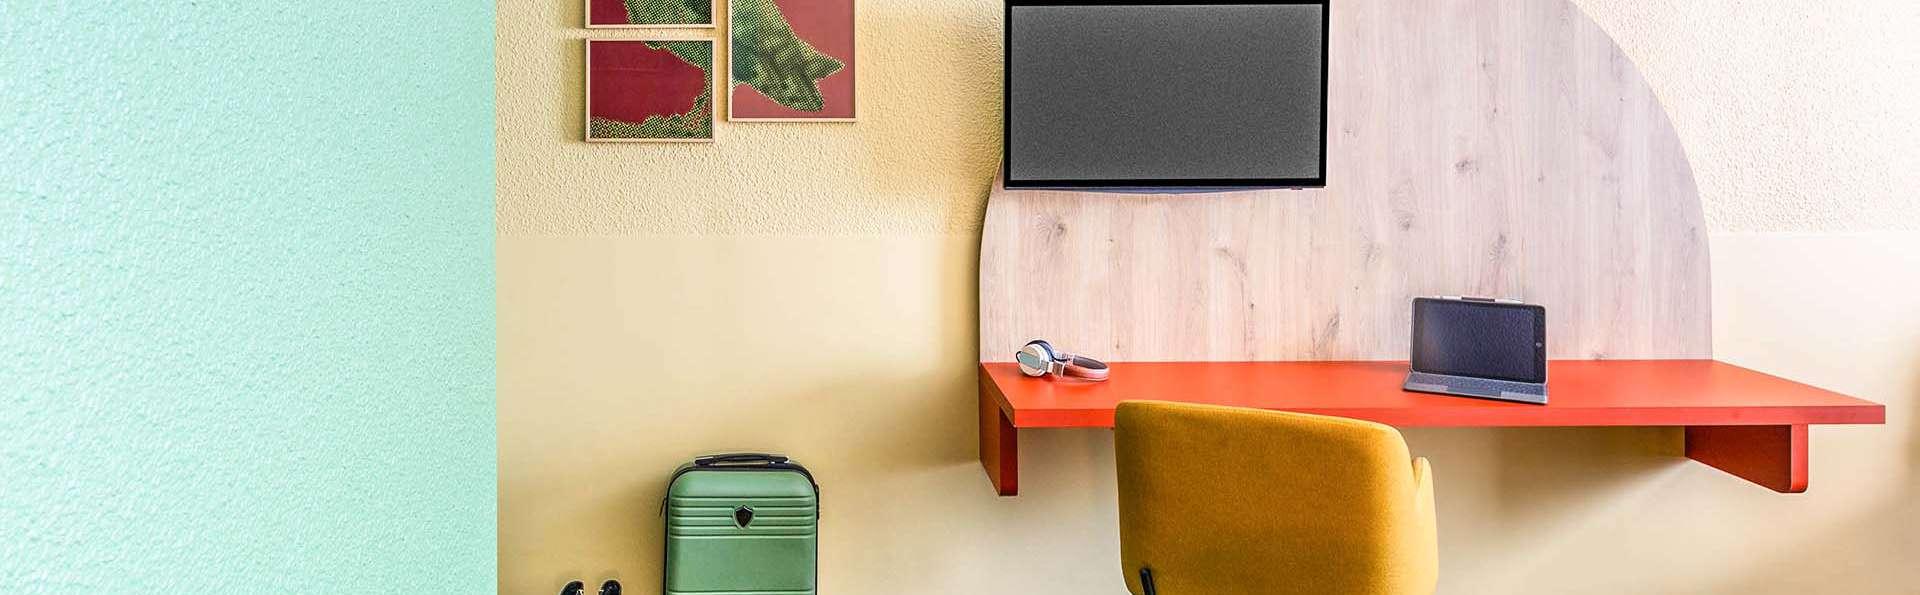 Hotel Arlon by Accor - EDIT_ROOM_04.jpg